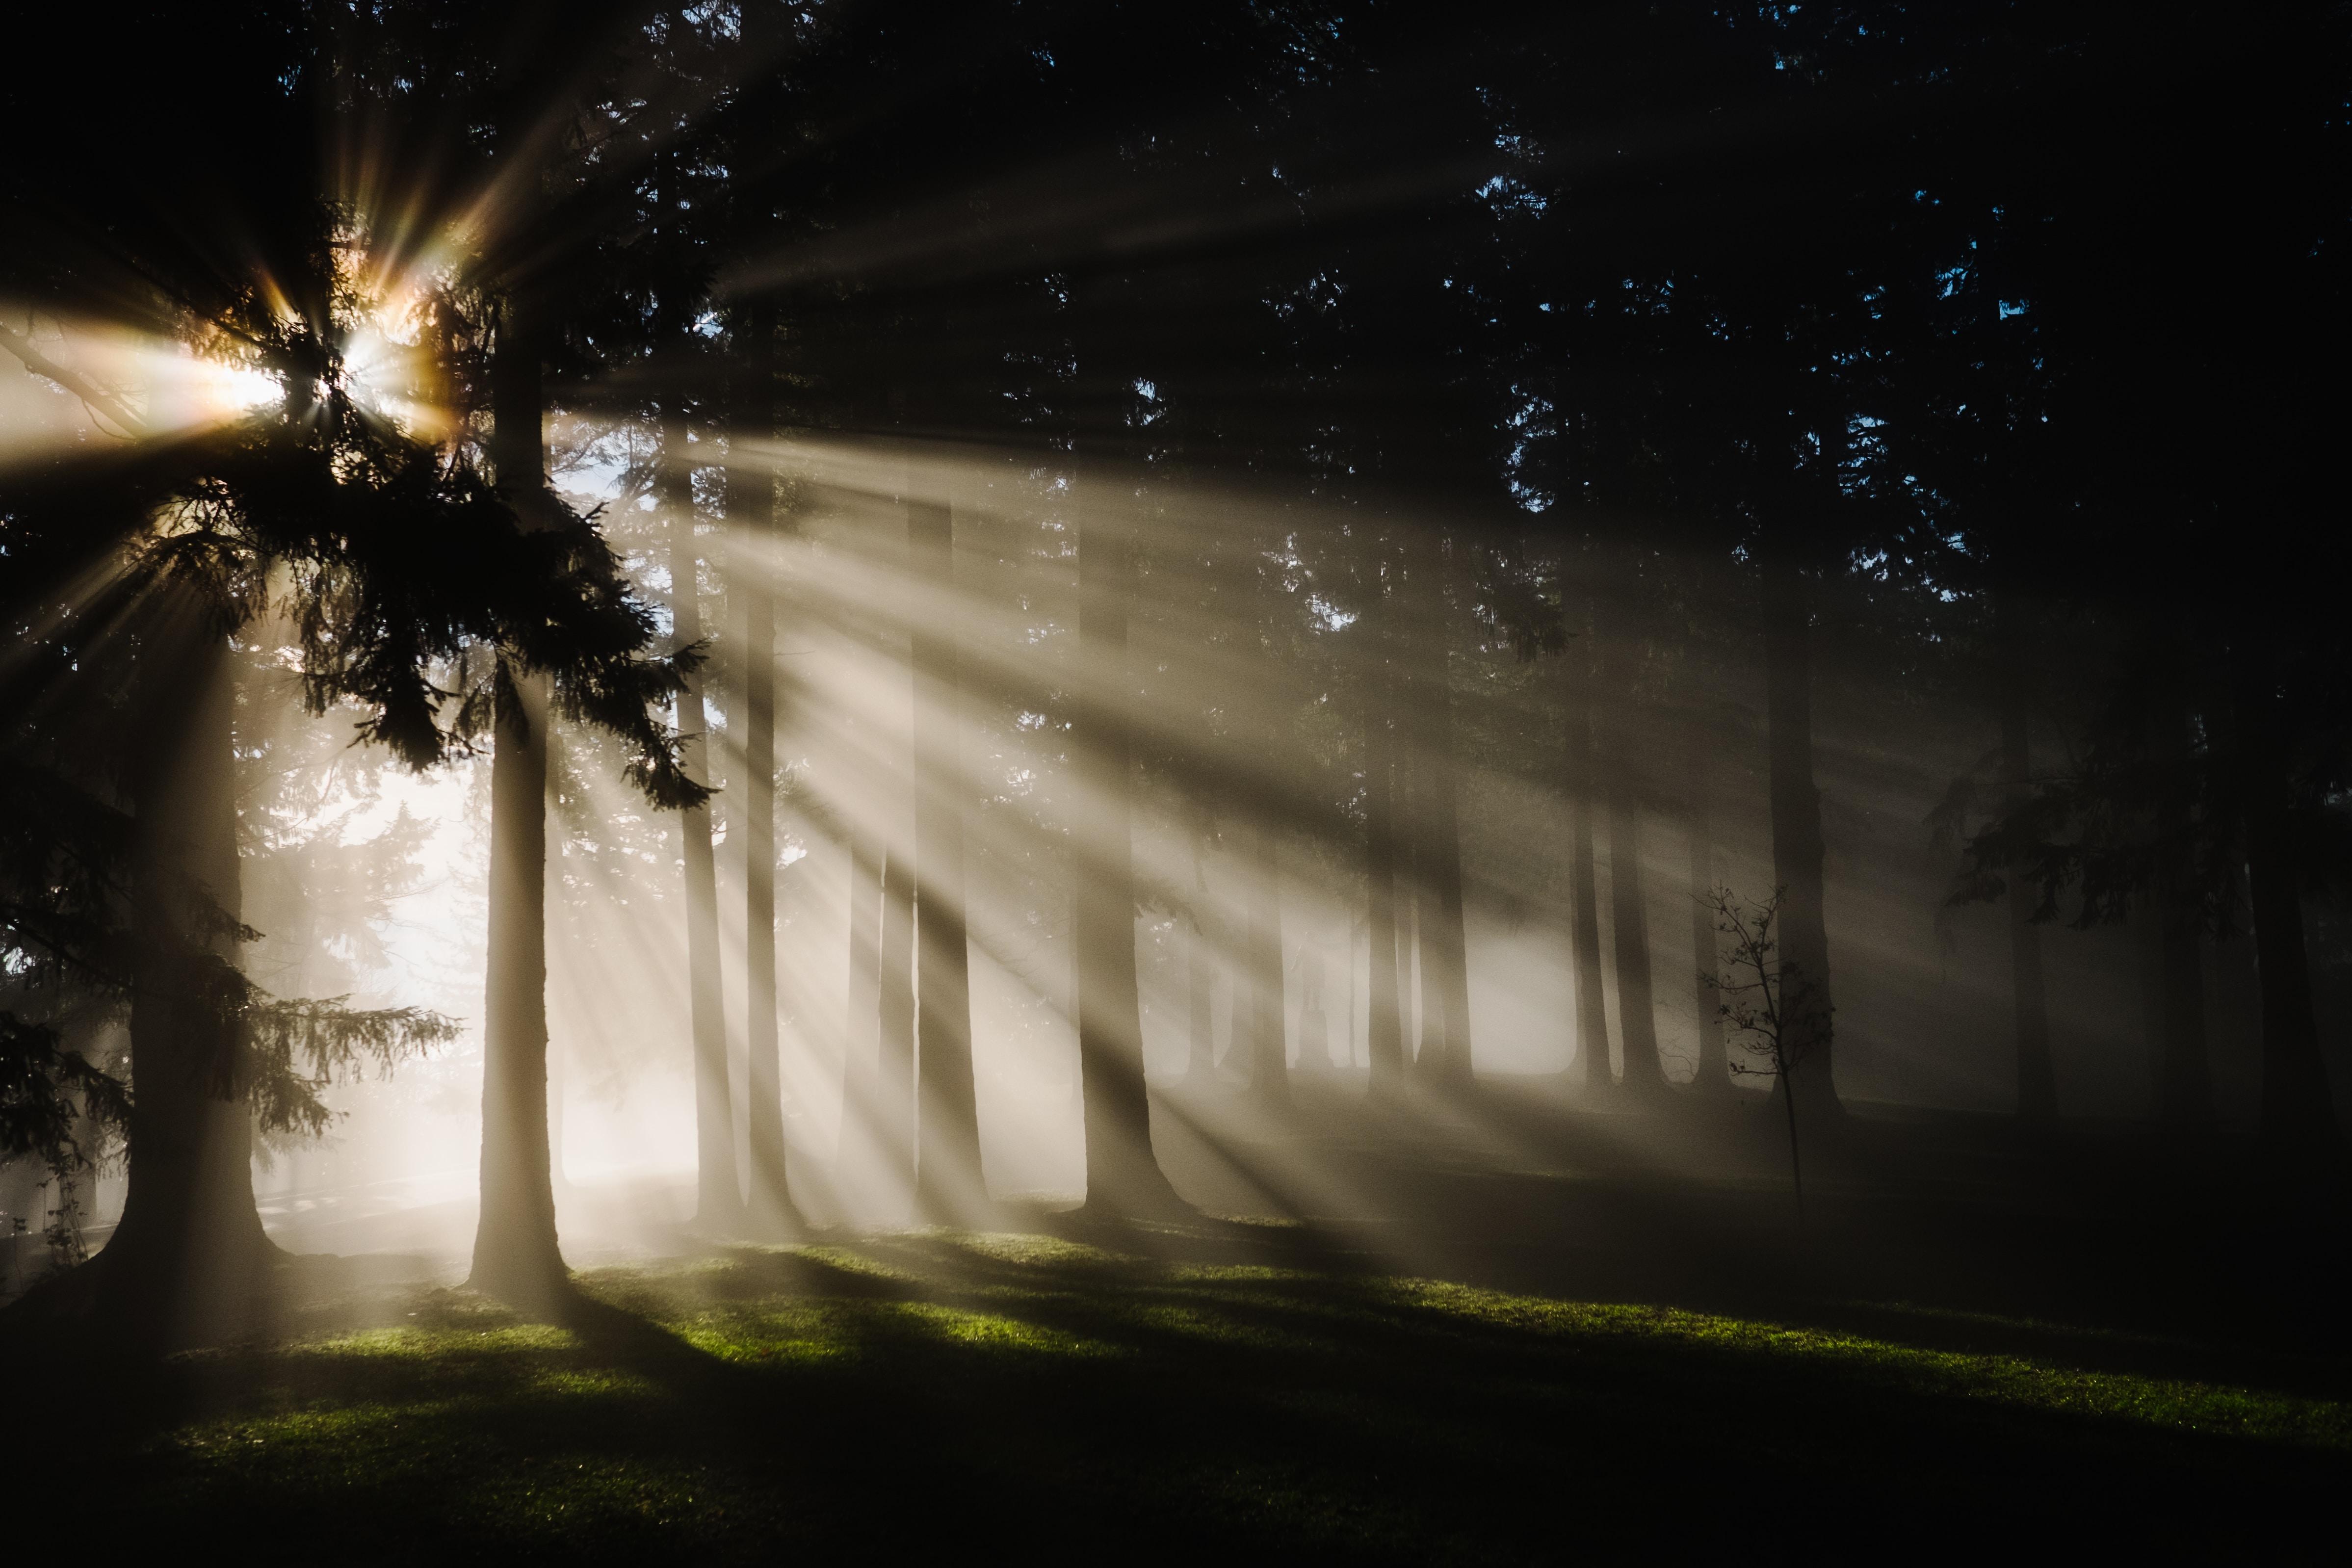 website sunlight through trees